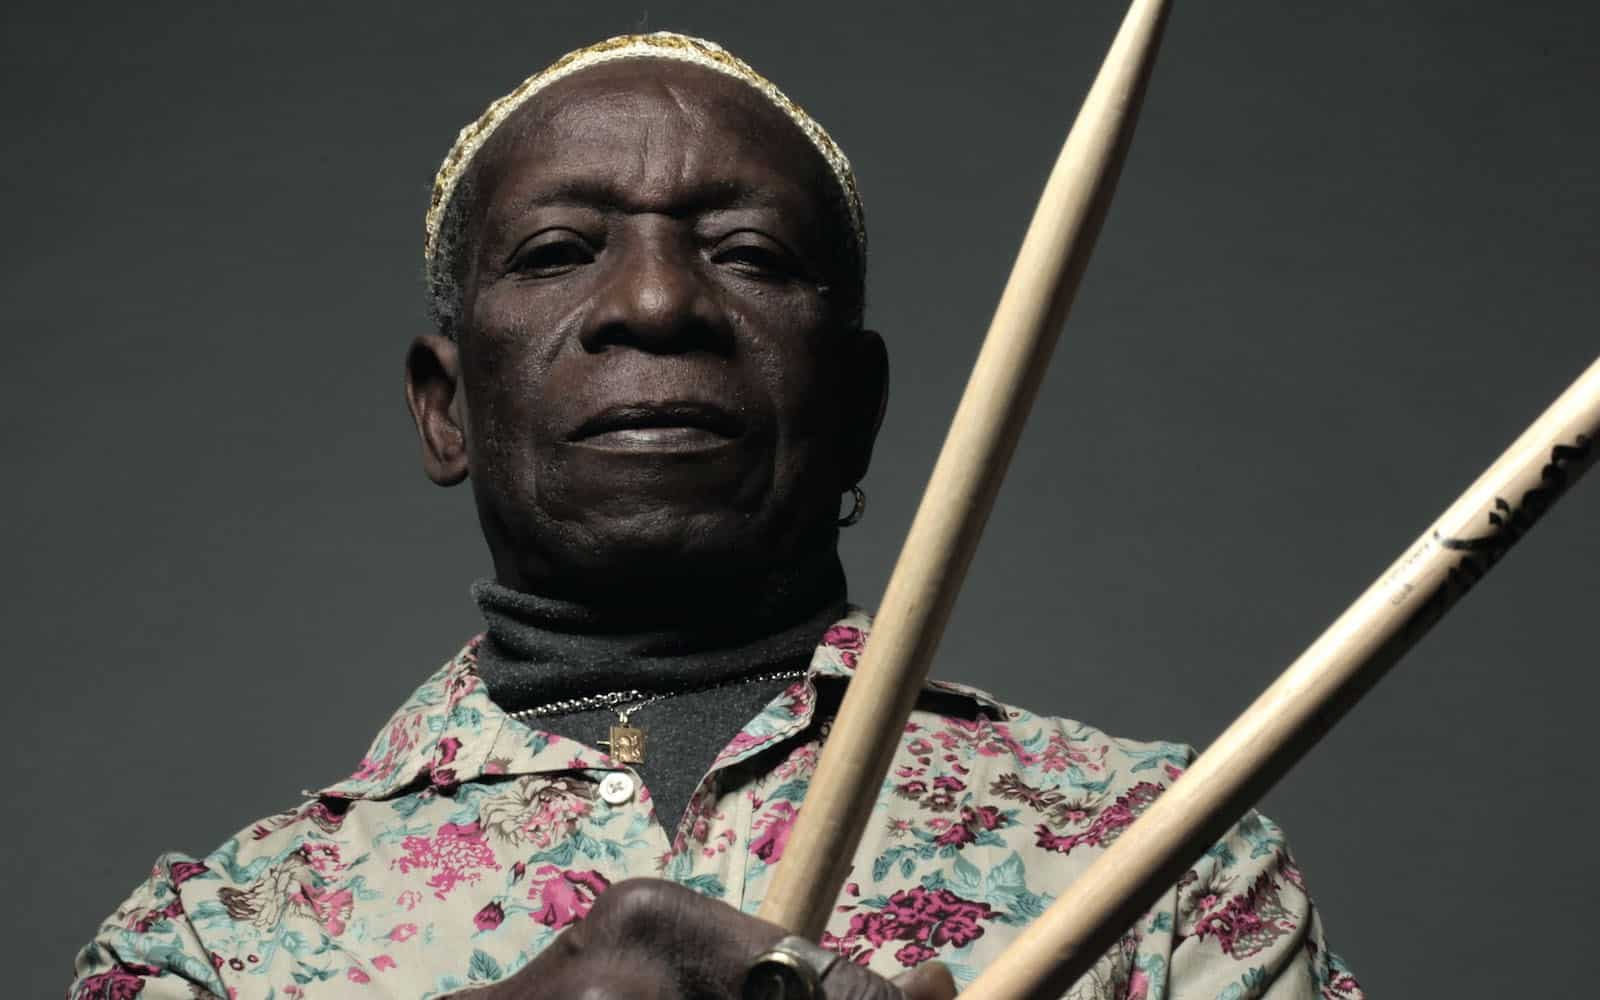 Remembering Tony Allen, a bonafide African music hero